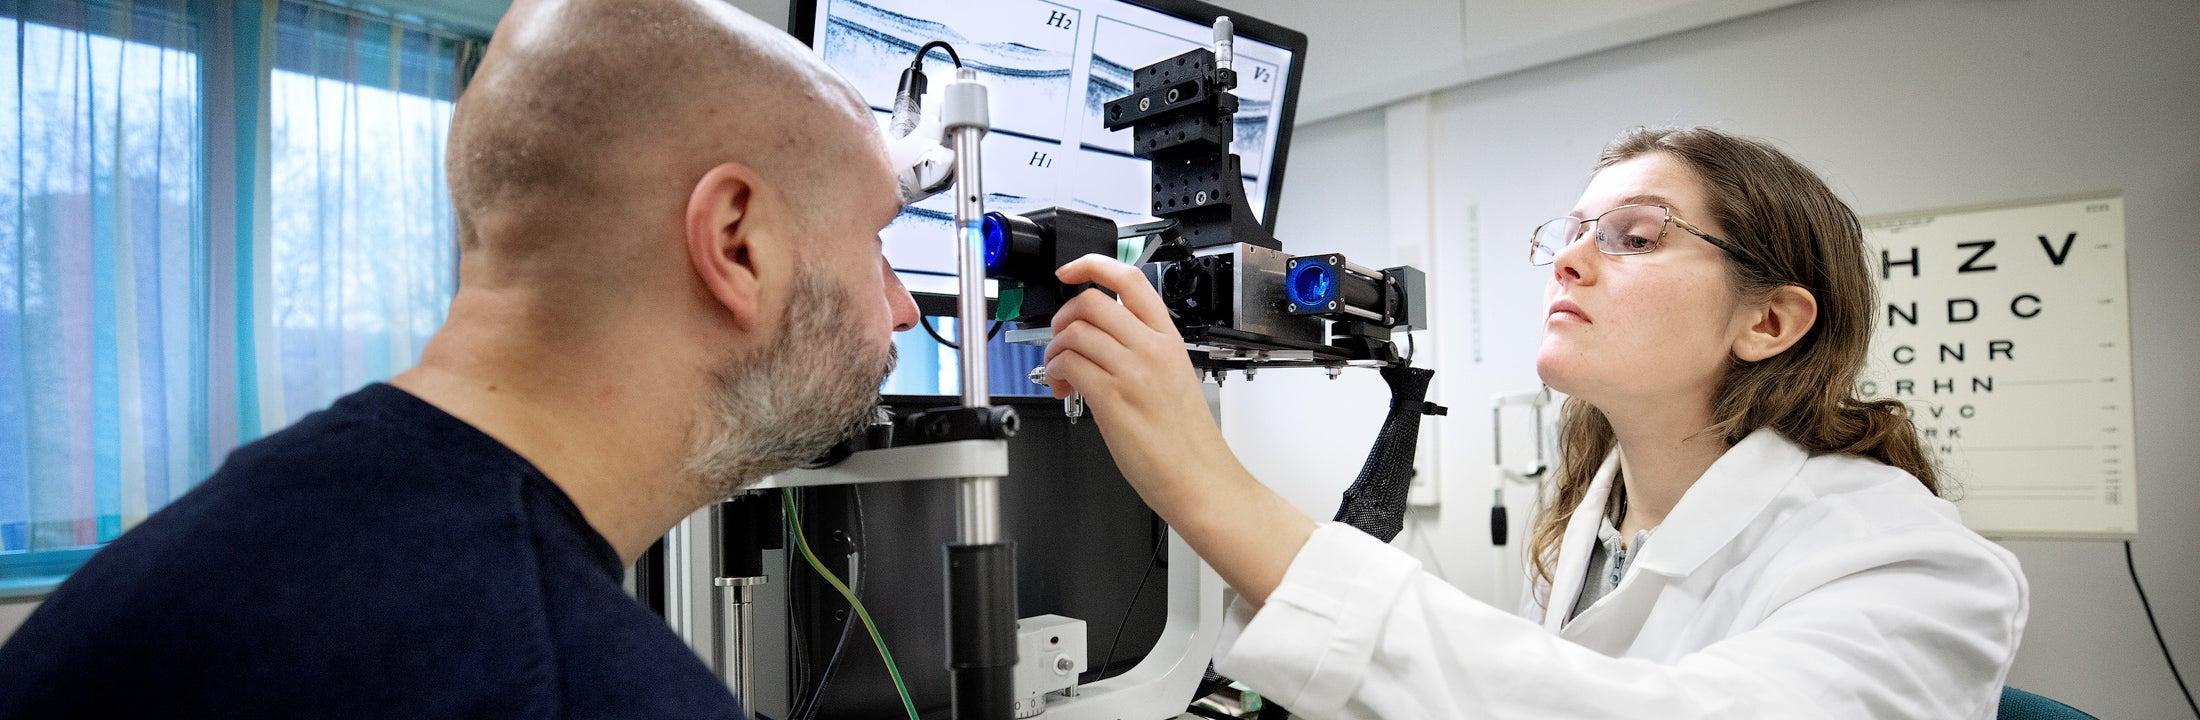 Opstelling PhD onderzoek in het VUmc